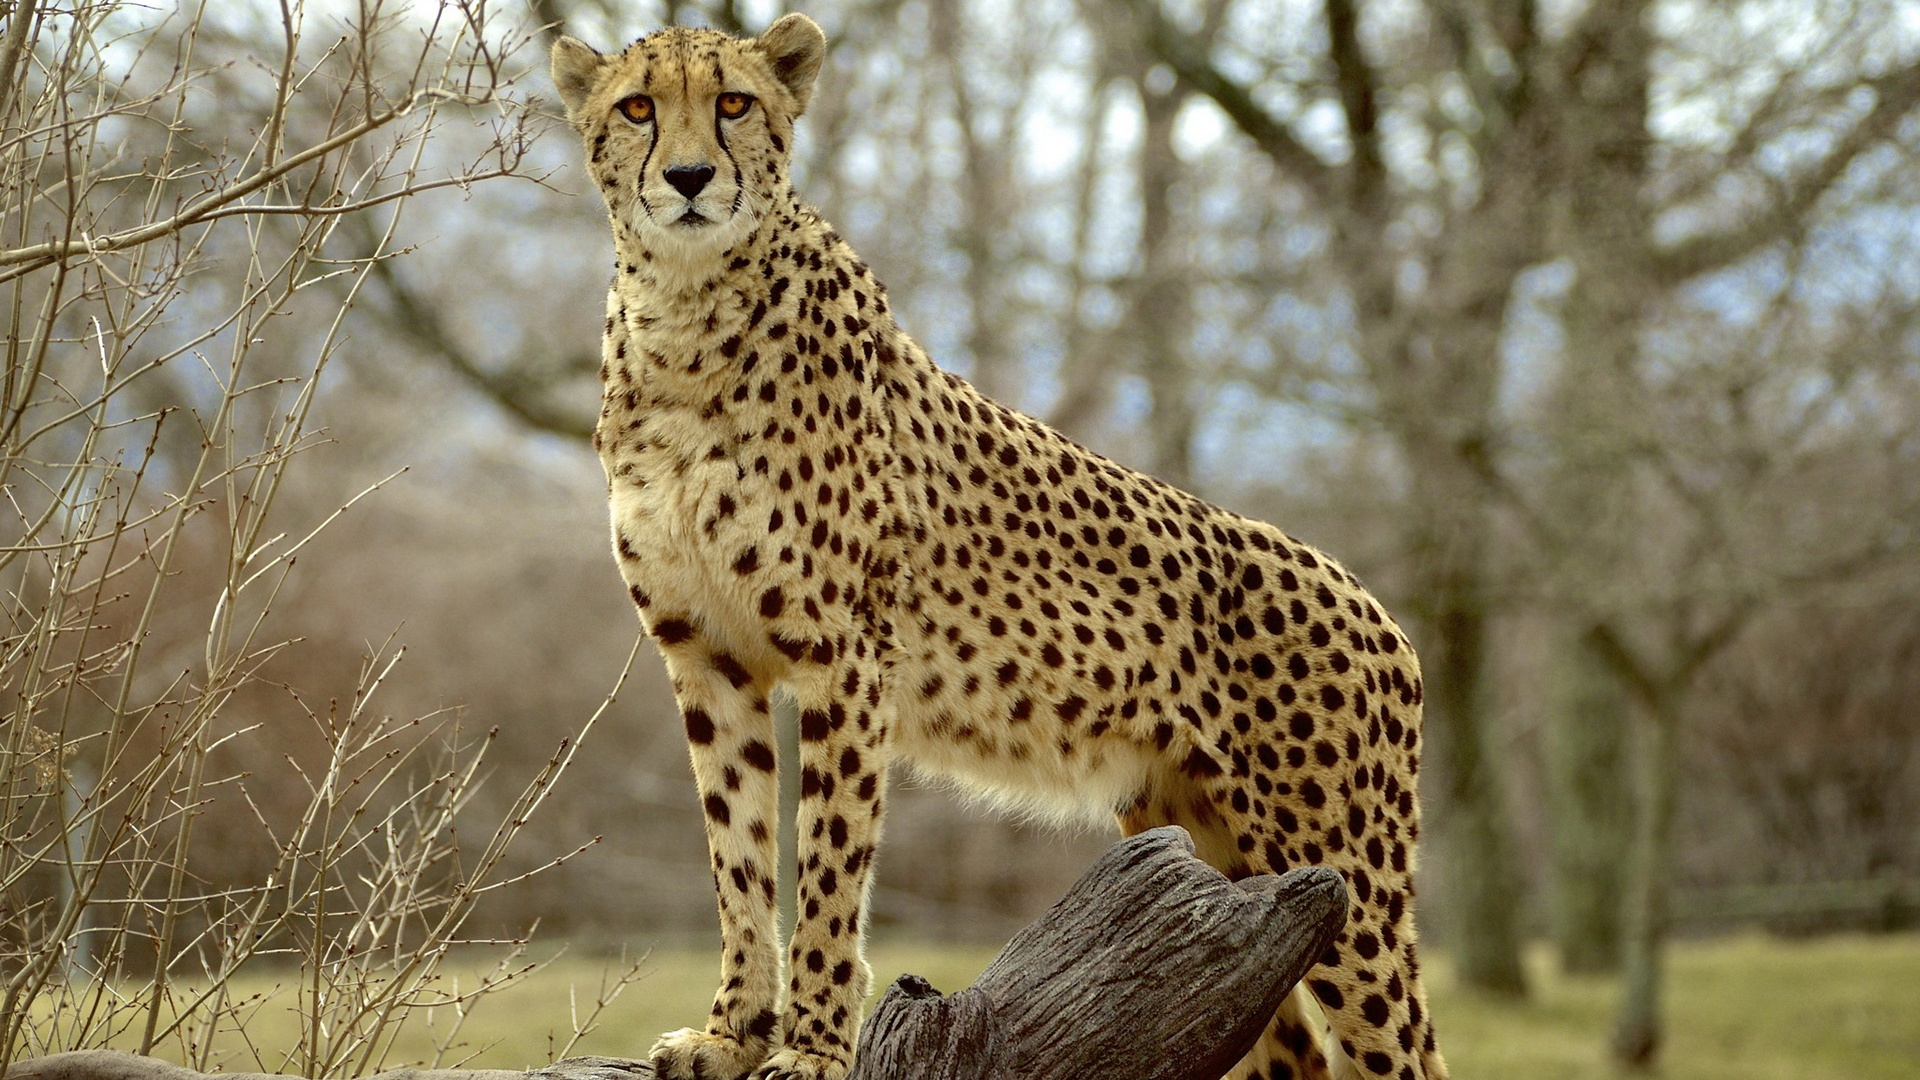 Wallpaper Animal Photography Cheetah Predator 1920x1200 HD Picture